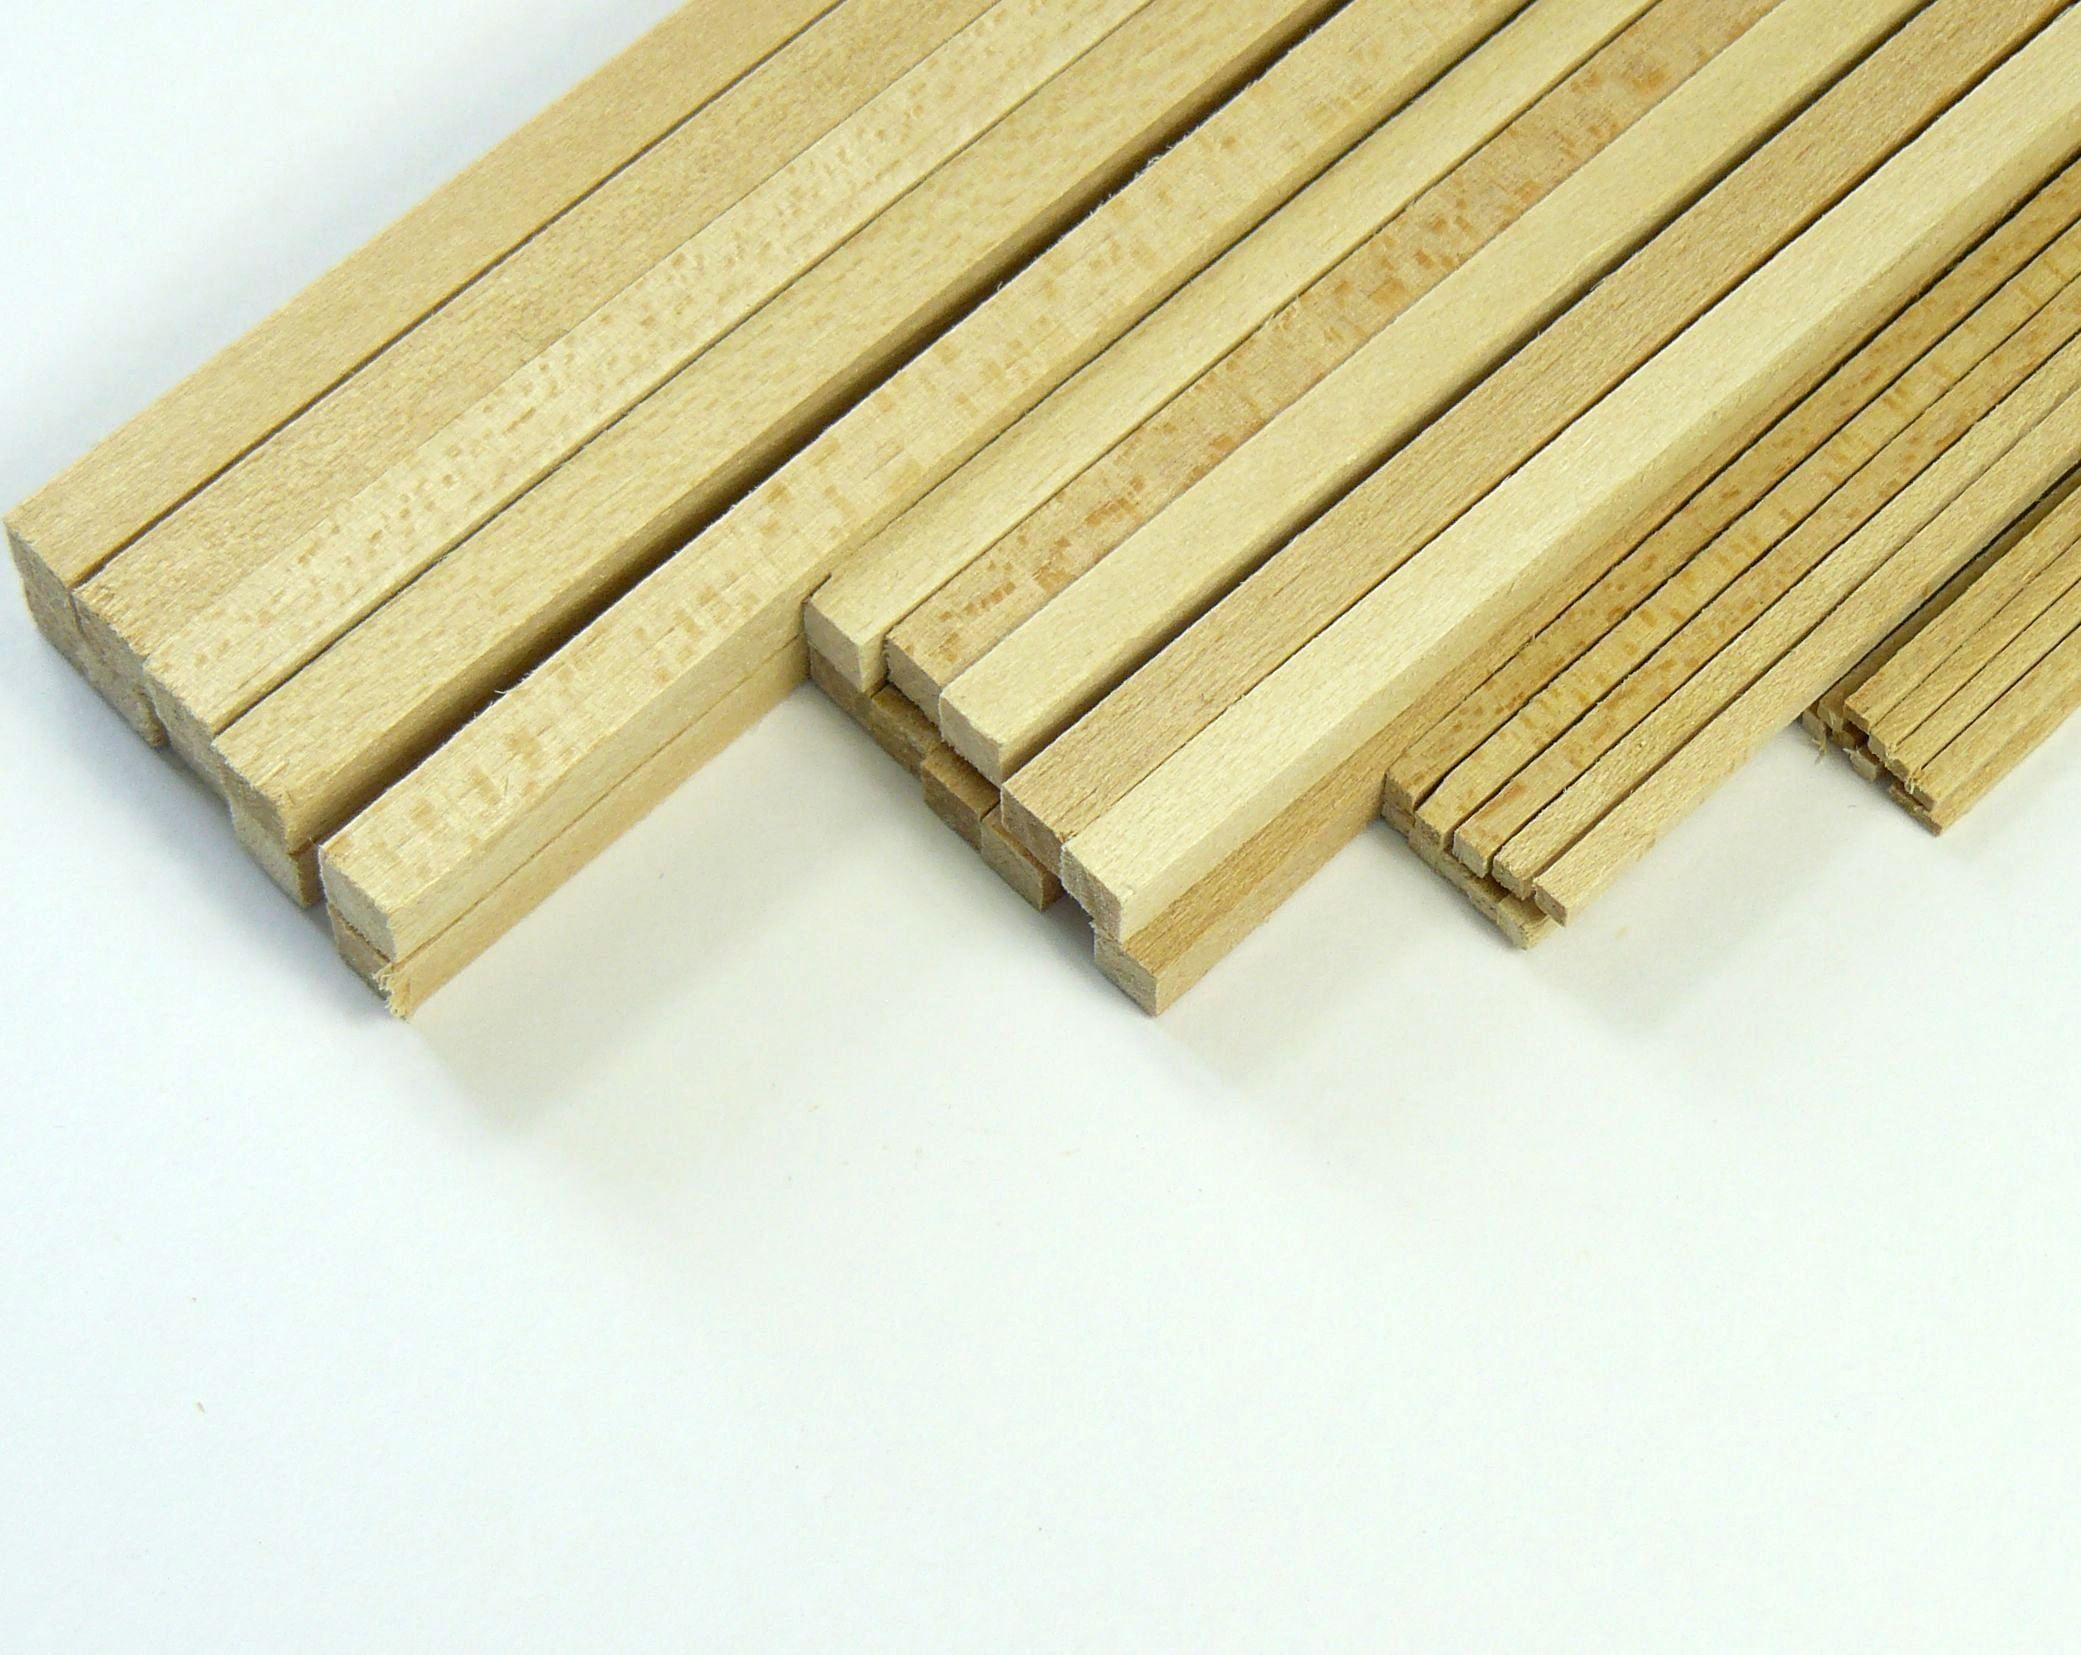 Bass Stripwood Bundles of 10